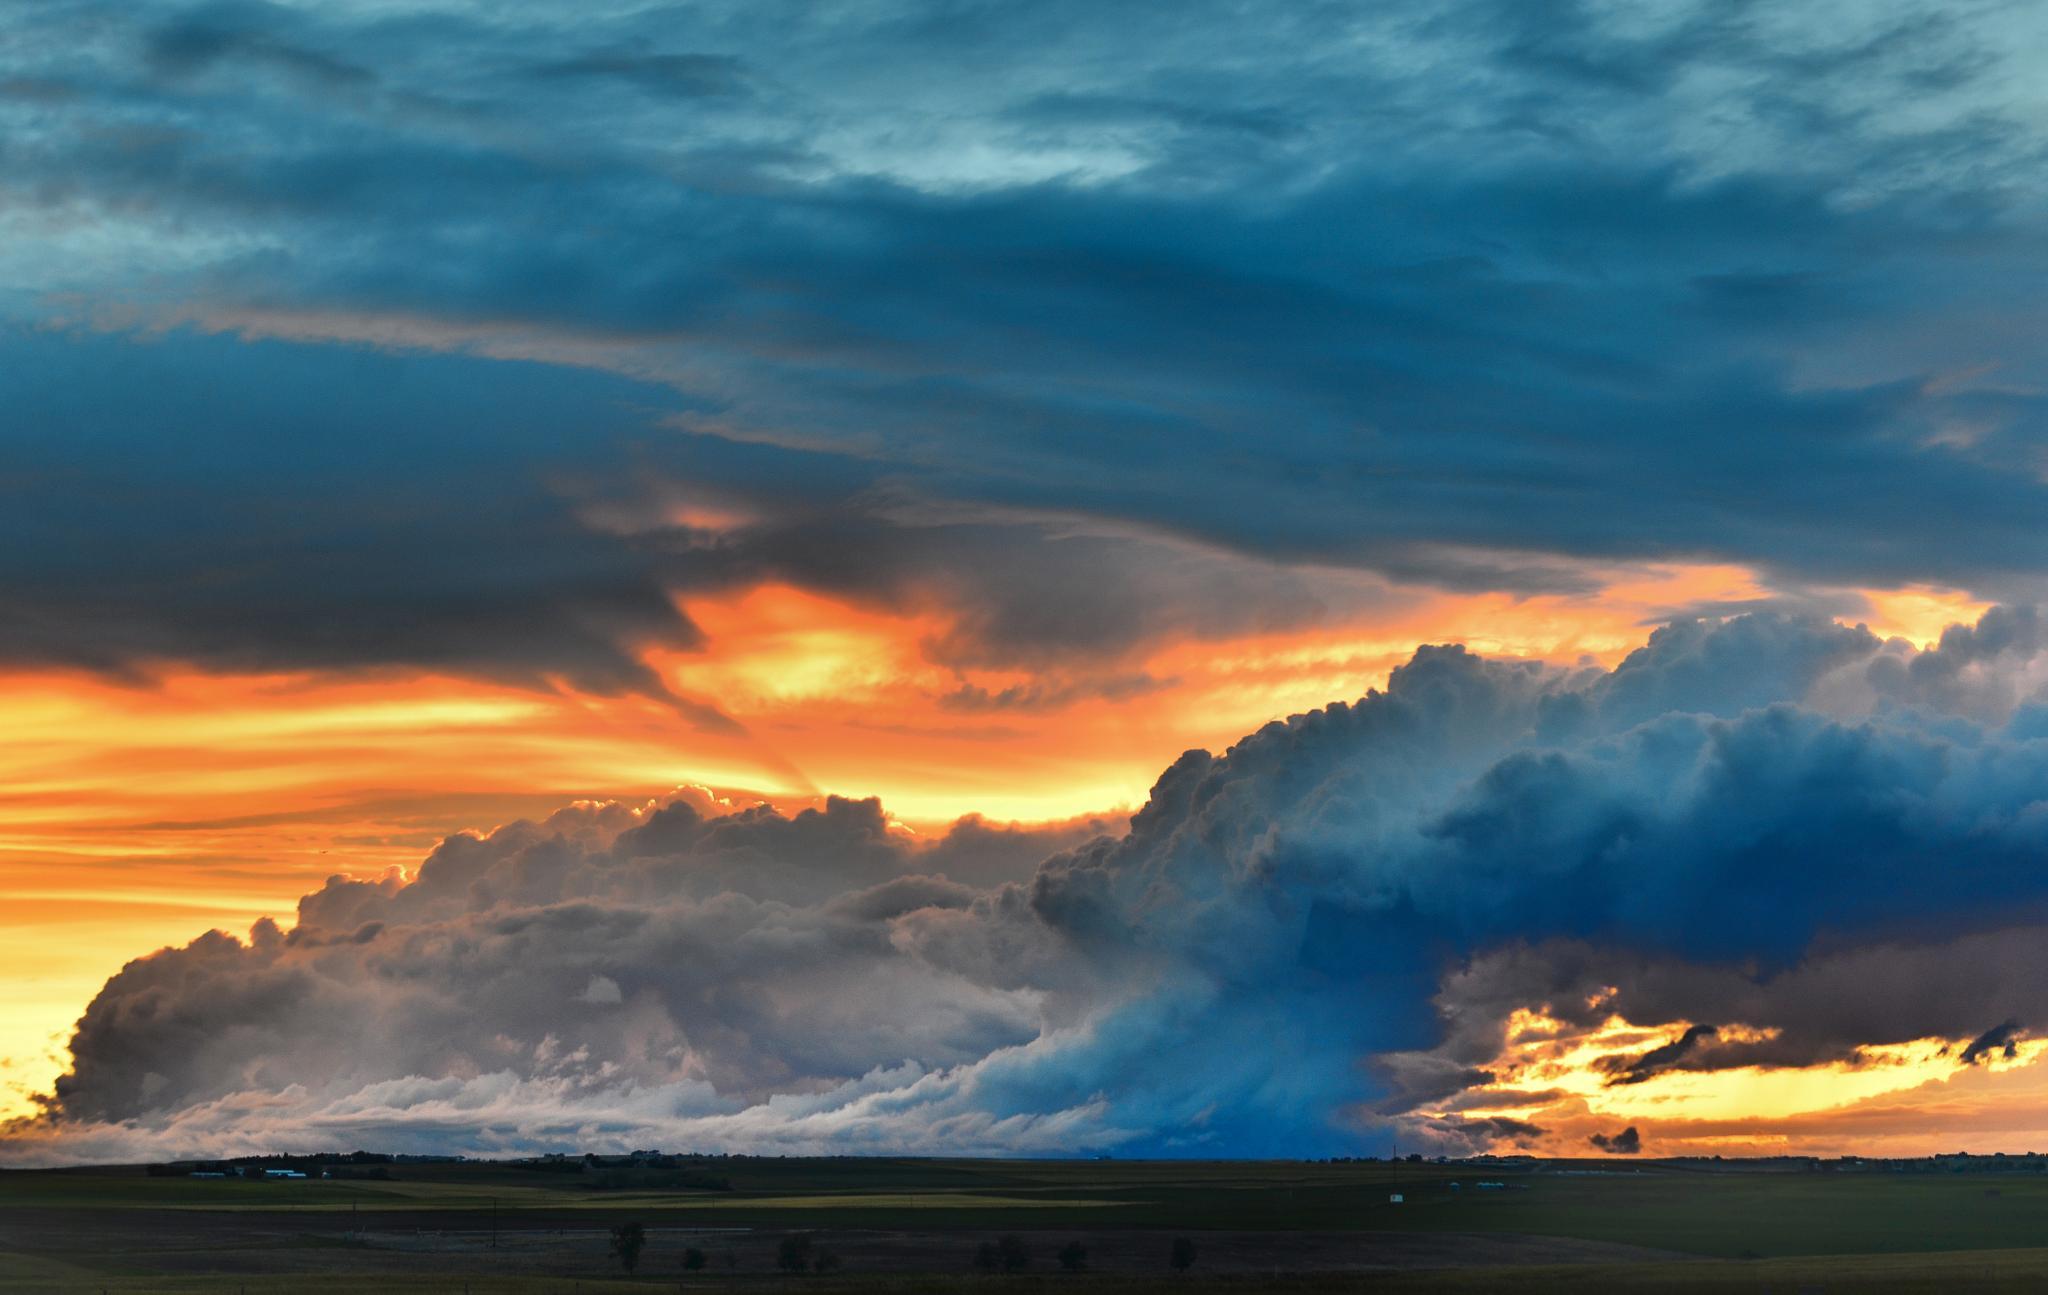 Evening prairie sky, storm coming. by Merle Layden